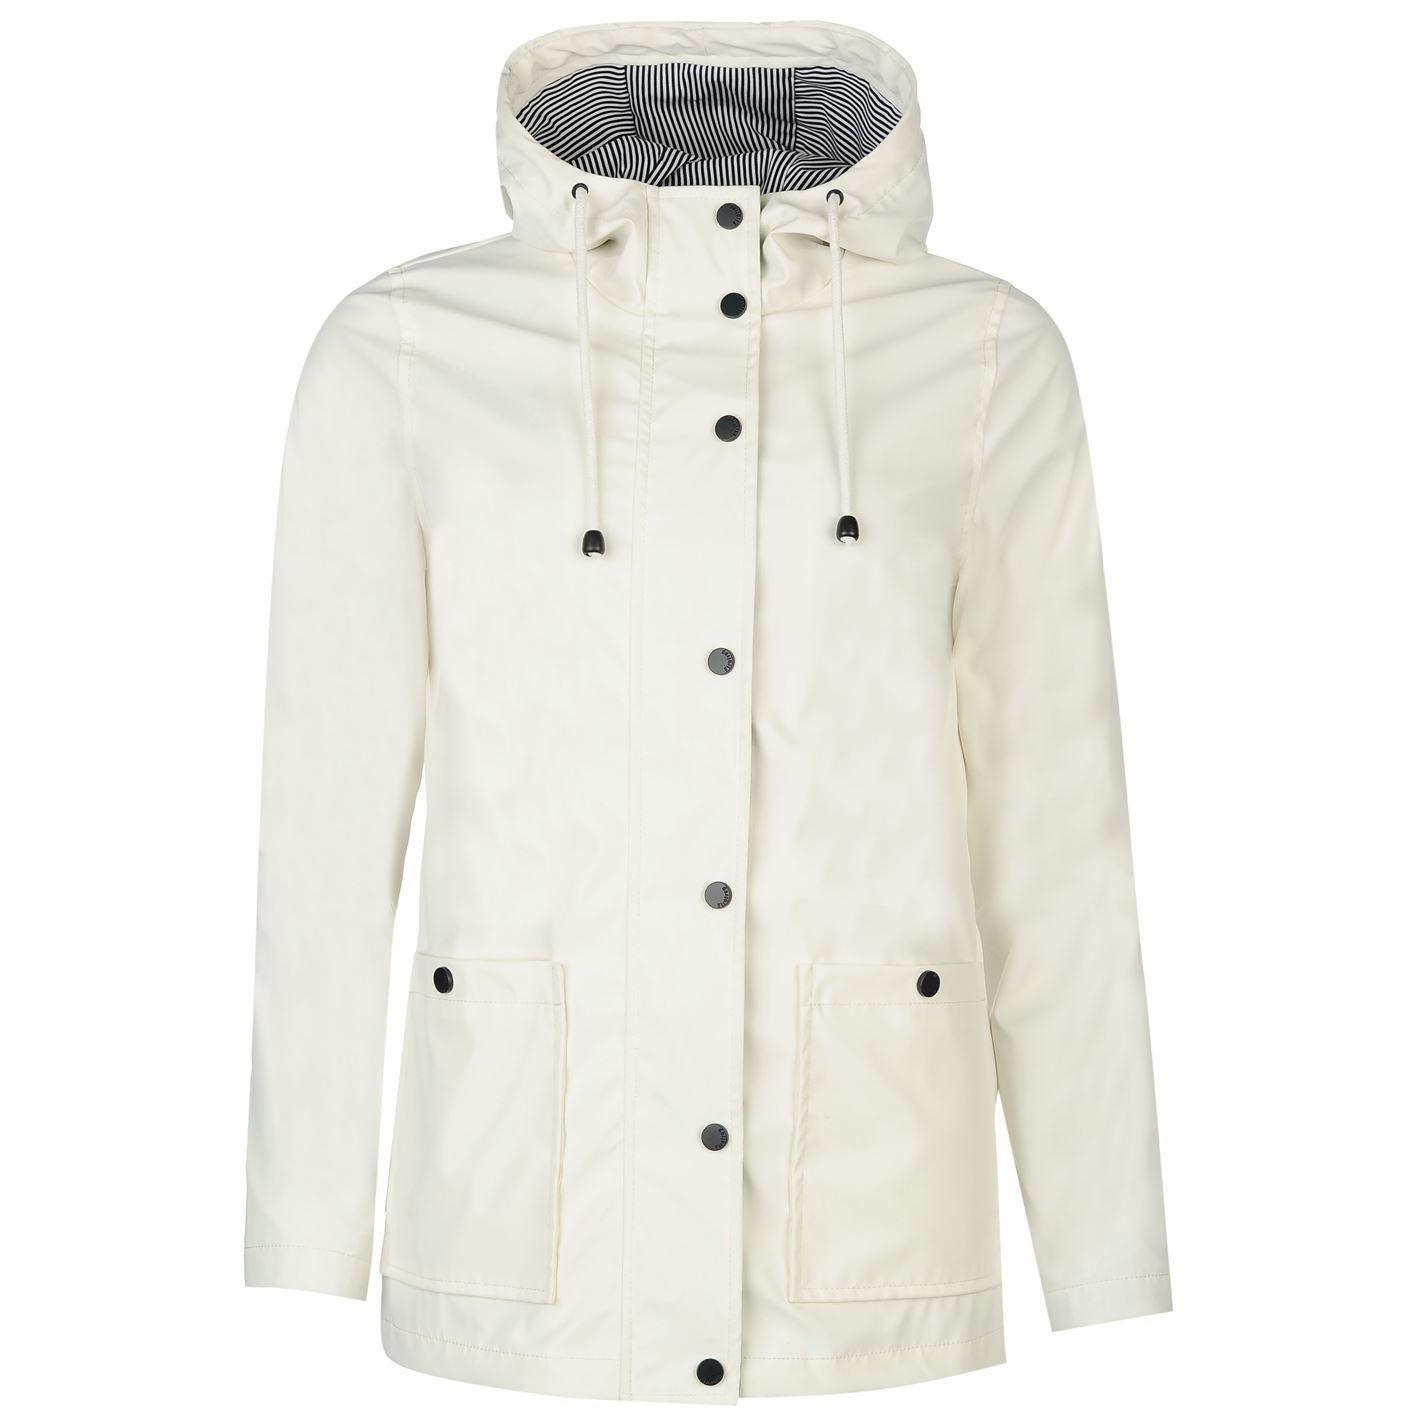 Firetrap | Firetrap Rain Mac | Ladies Coats and Jackets | Stuff to ...